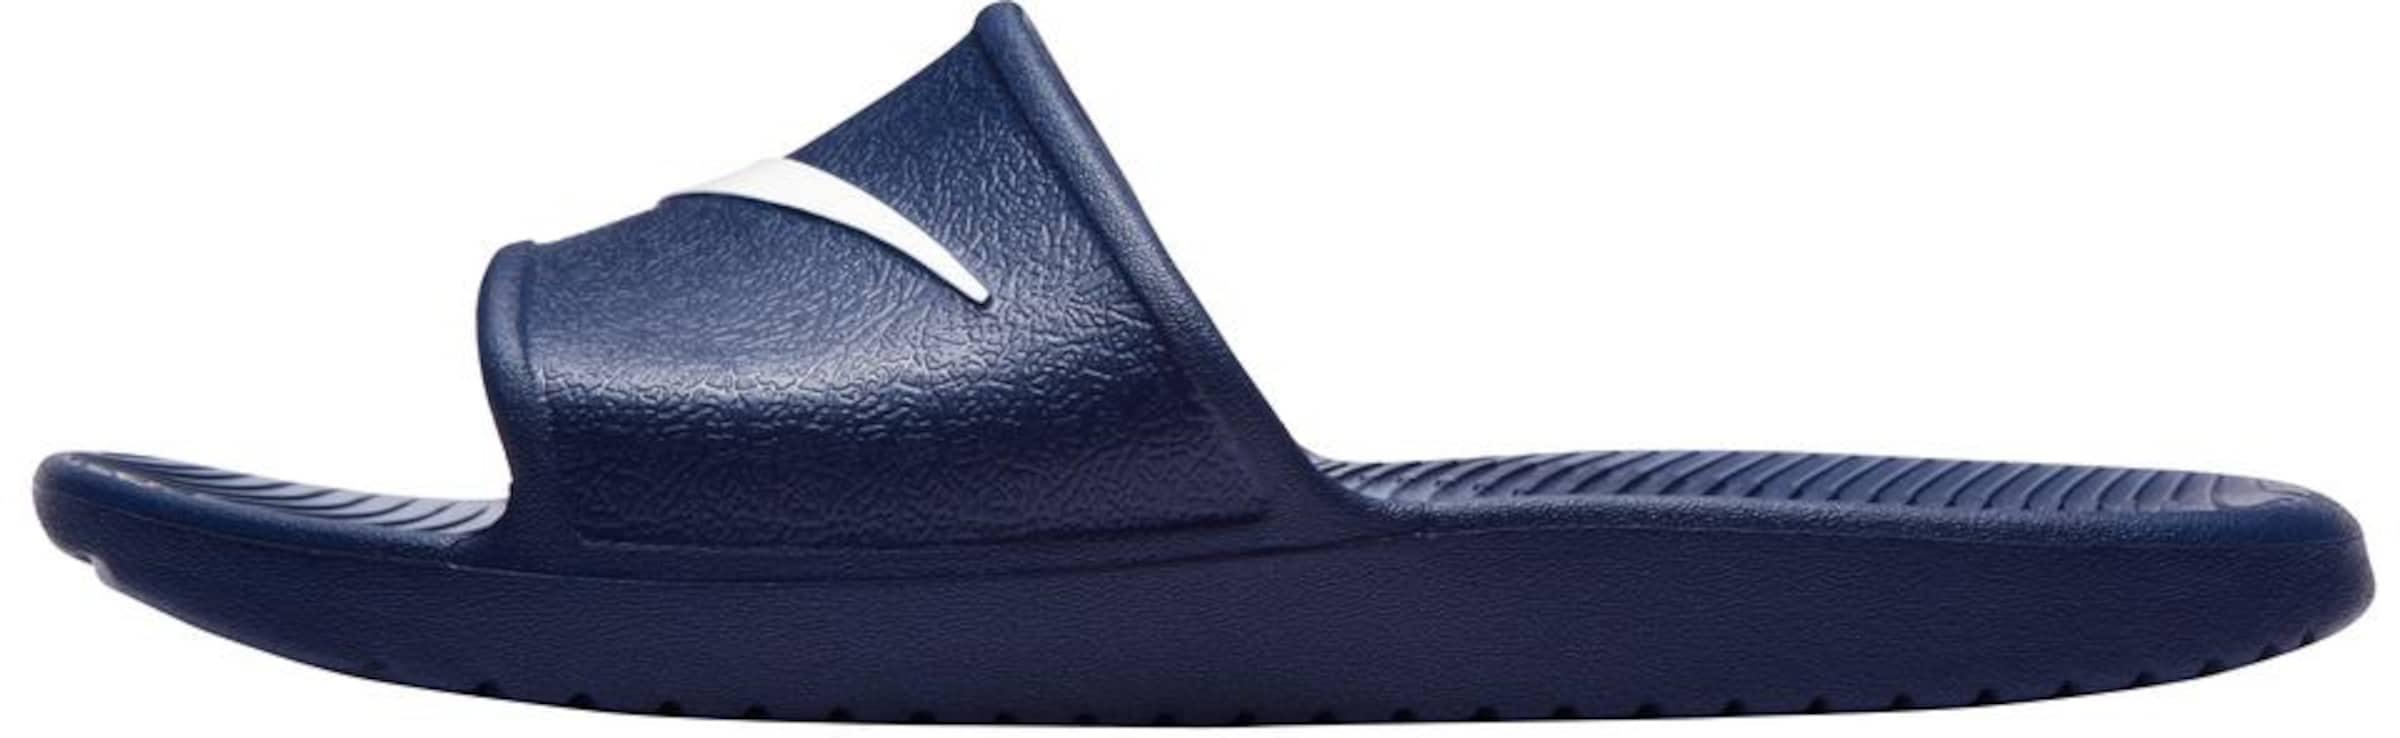 Nike Sportswear Shower | Badesandale  Kawa Shower Sportswear Slide c0a95b